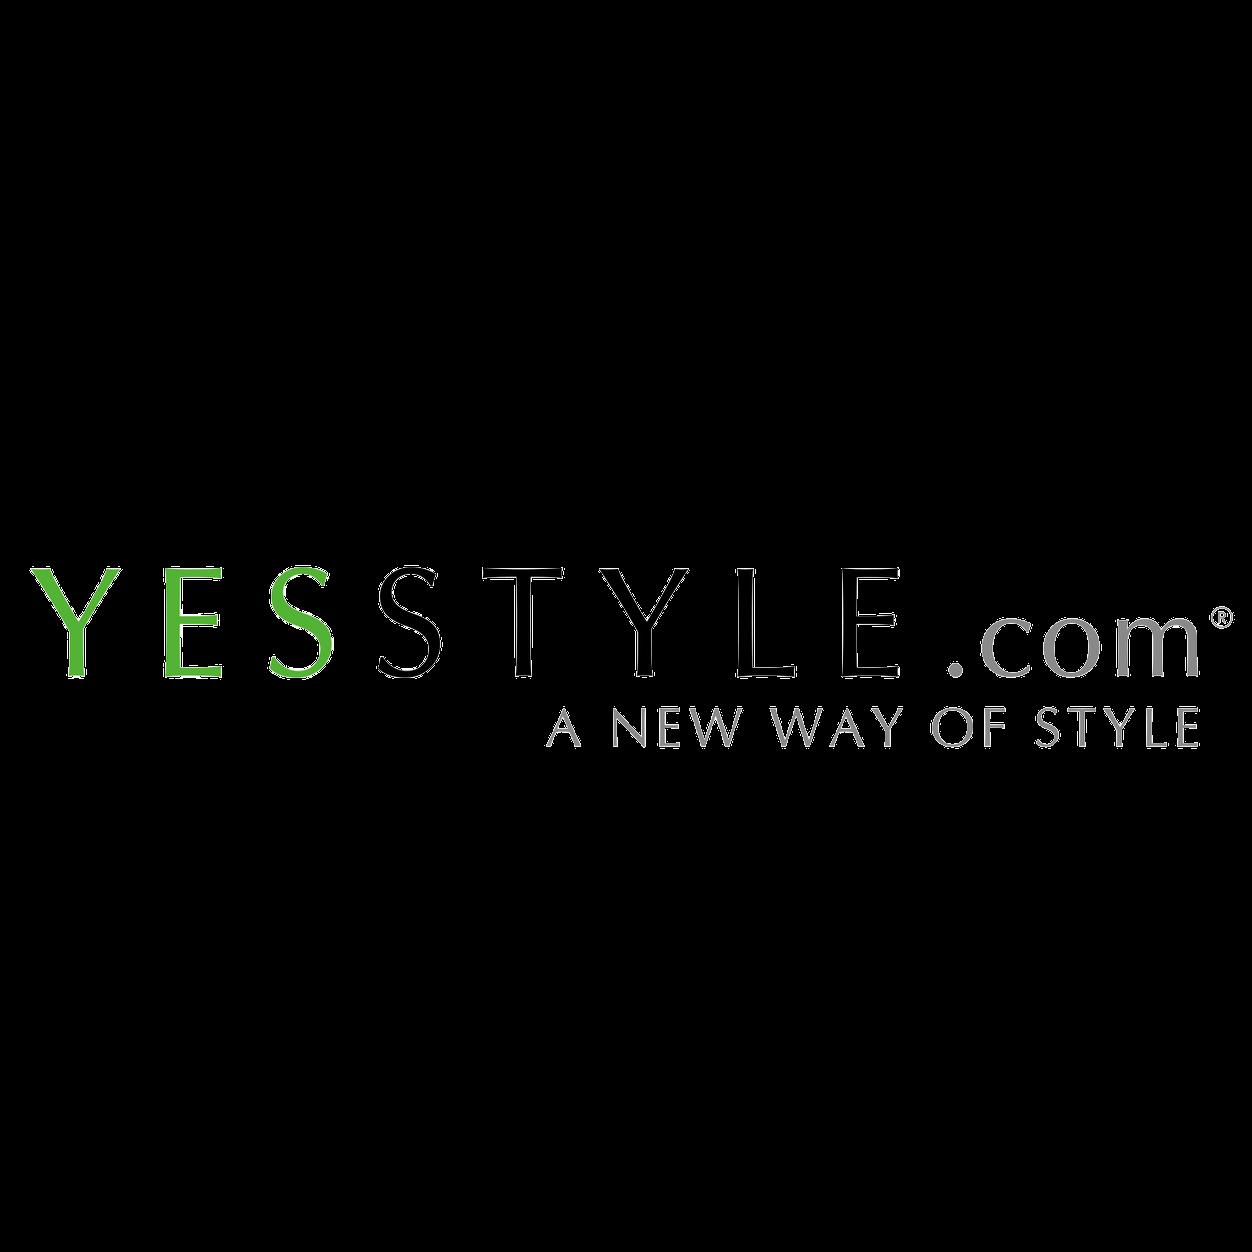 http://www.yesstyle.com